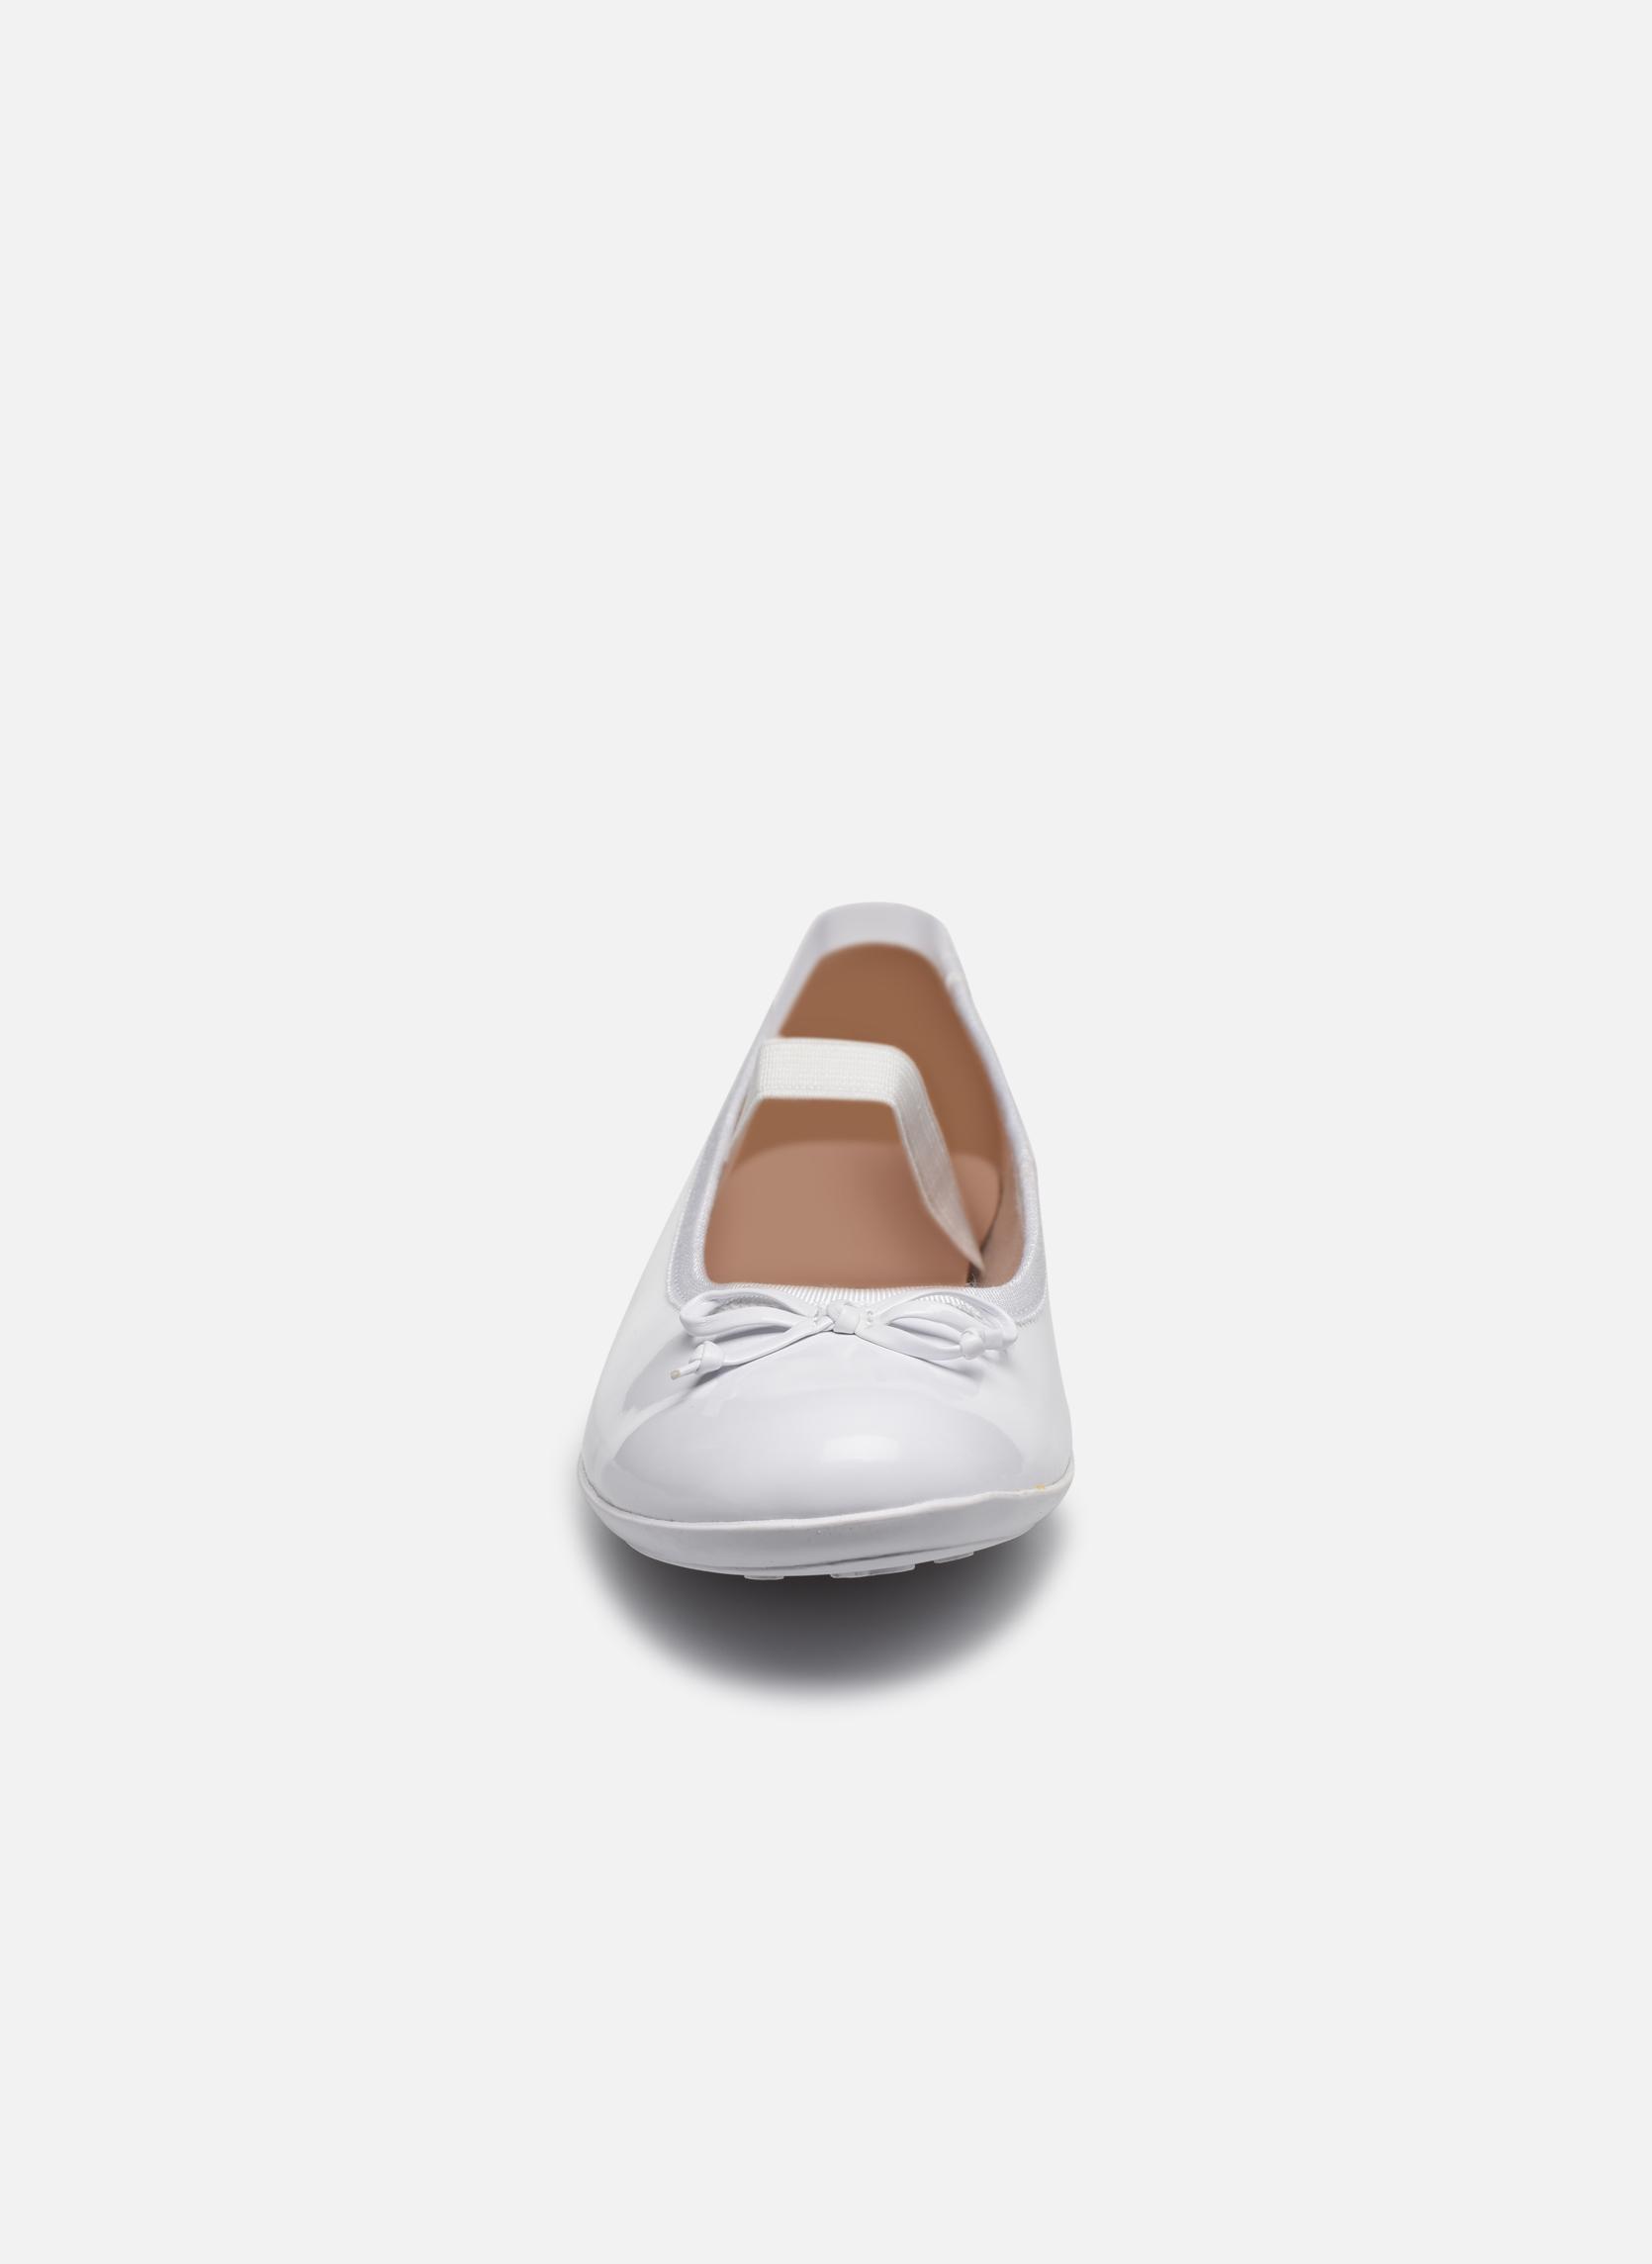 J Plie' I - J5455I White